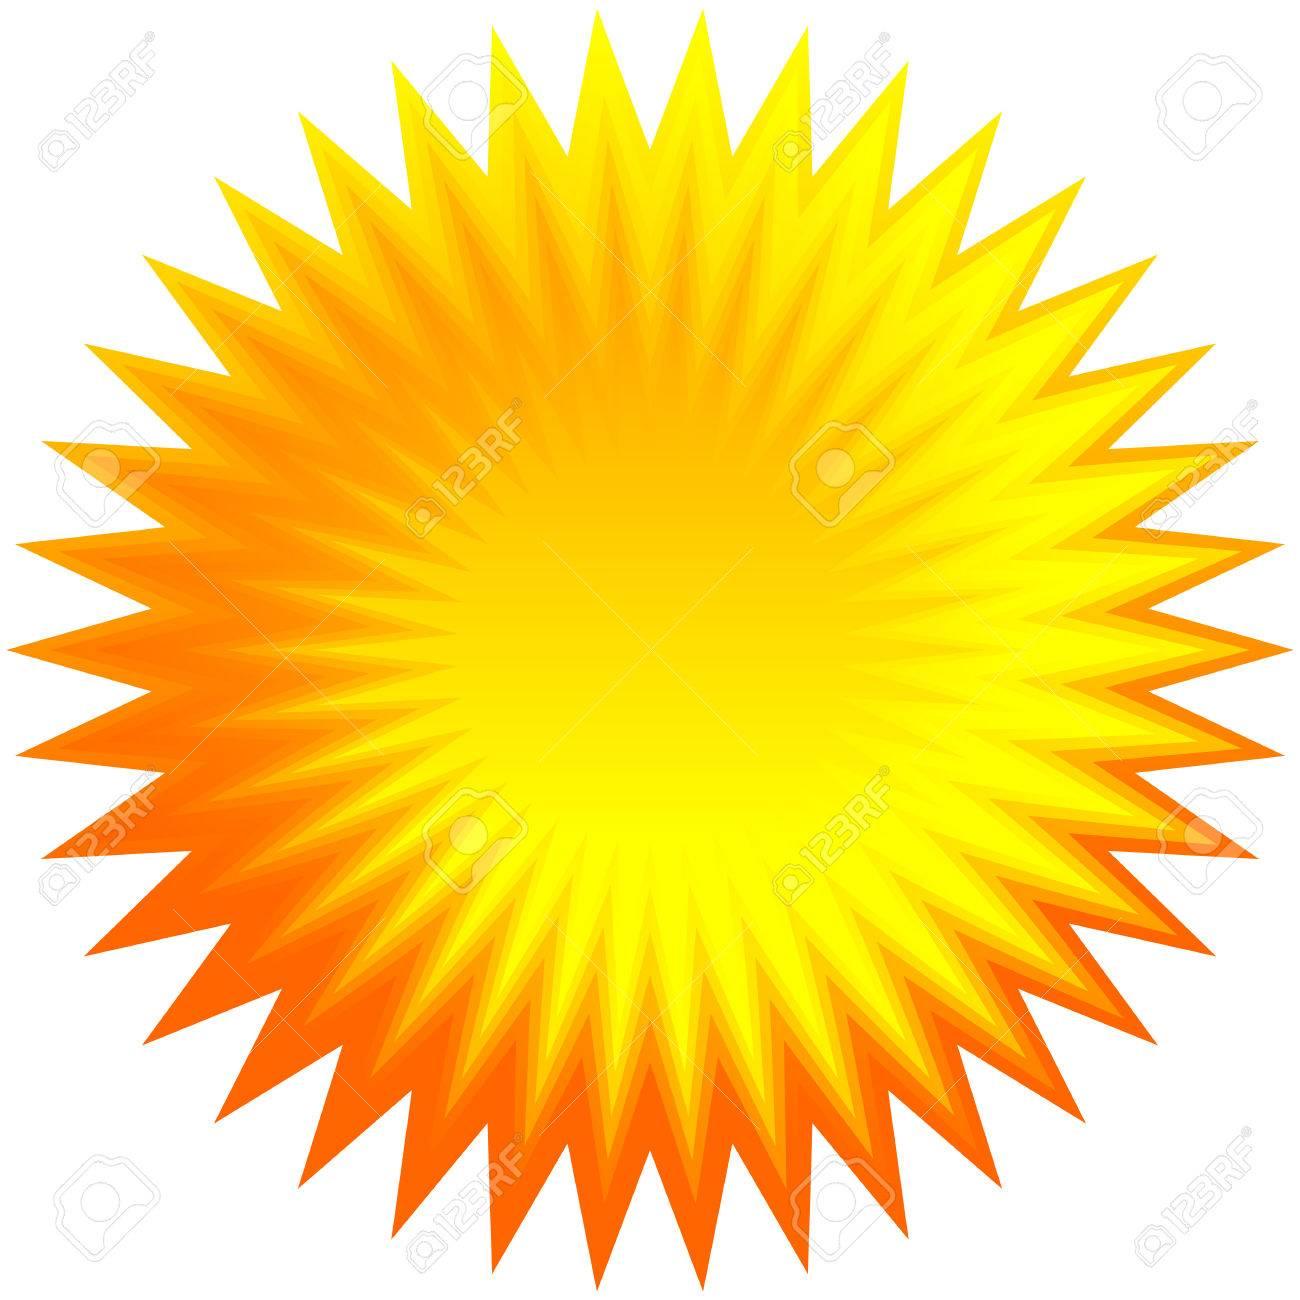 set of orange geometric sunburst starburst background royalty free rh 123rf com starburst vector png starburst vector download